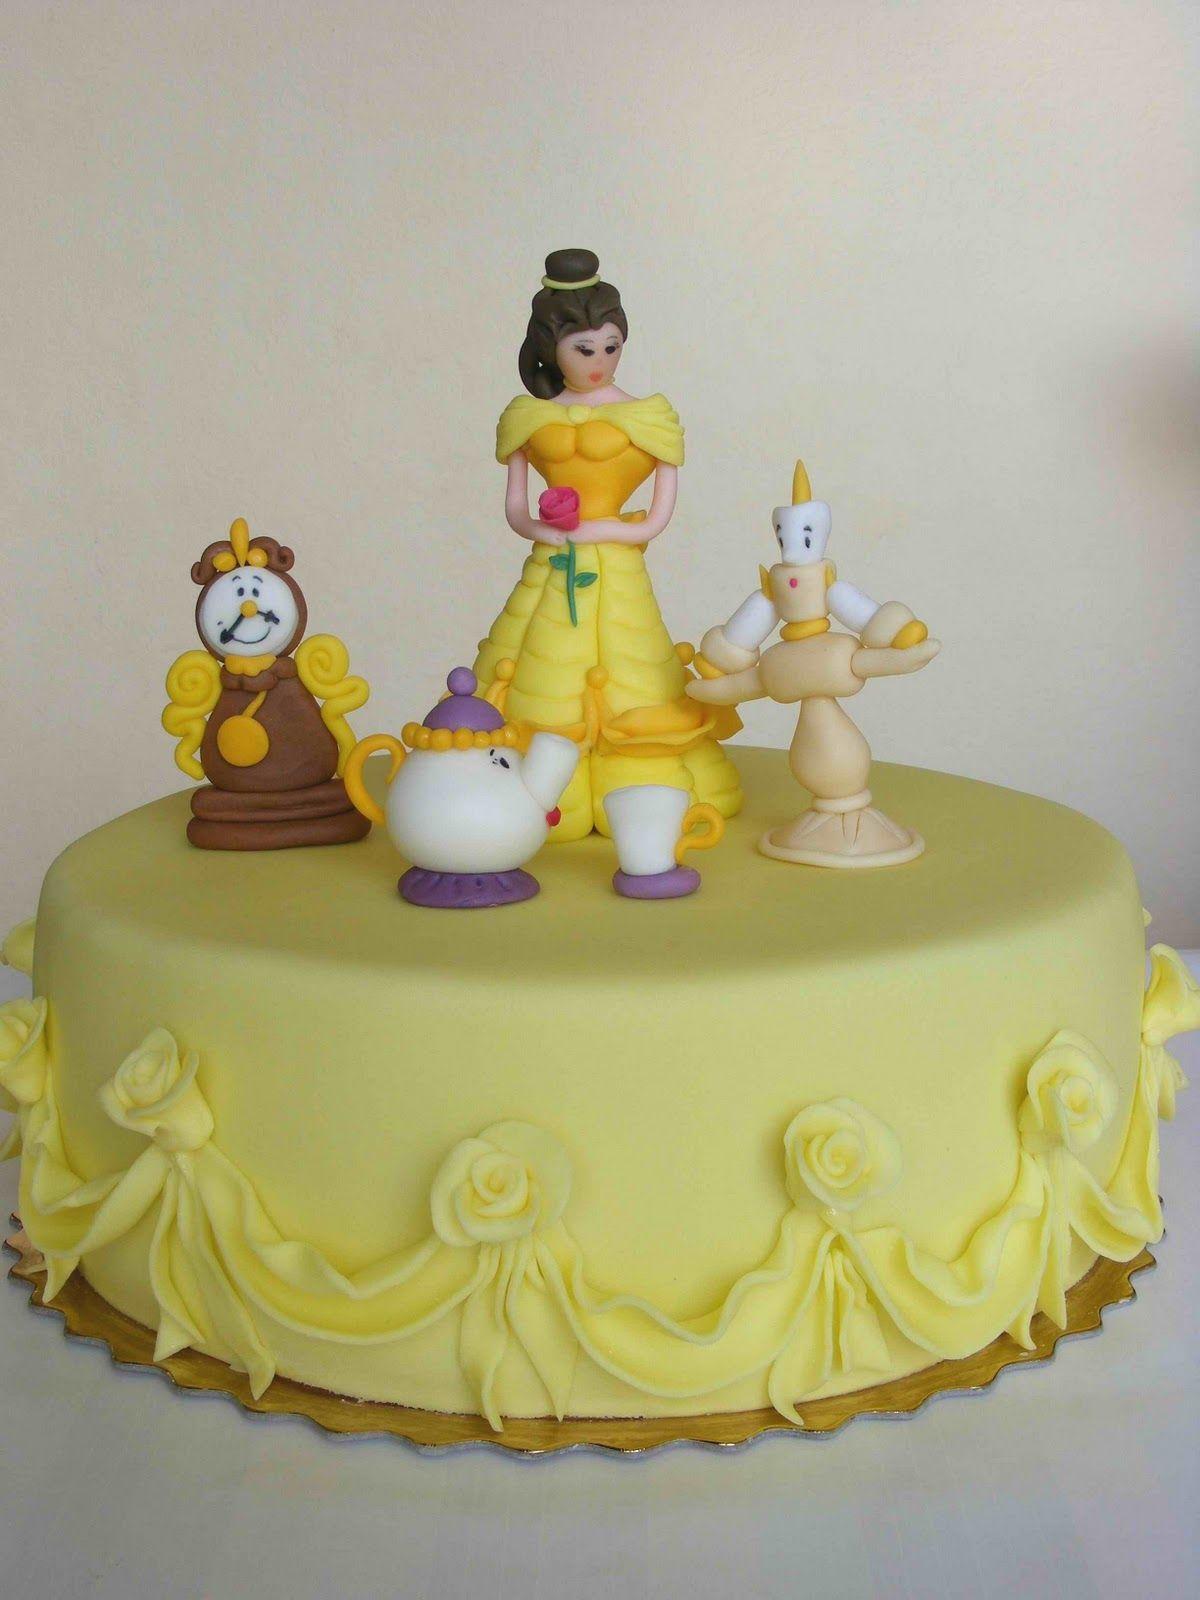 Beauty And The Beast Cake I Want